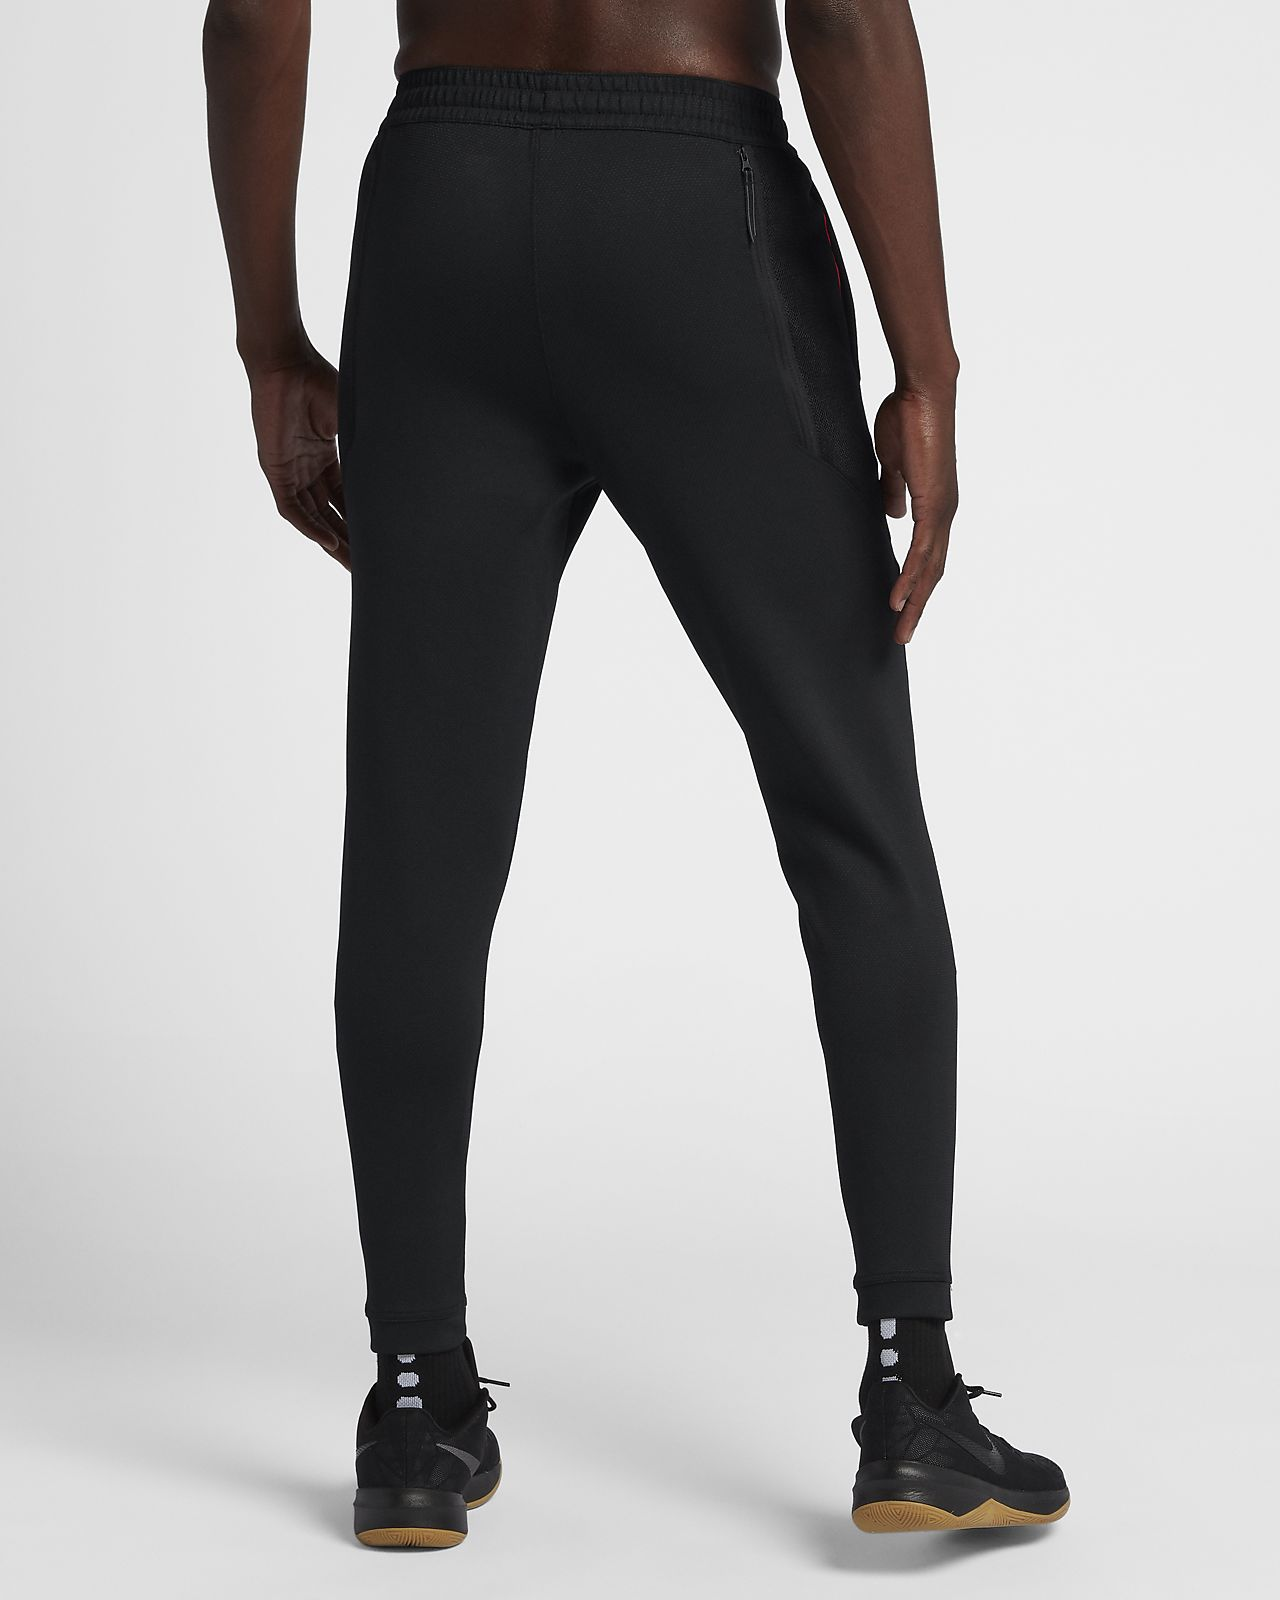 02c7ef7fa3f72 Pantalones de básquetbol para hombre Nike Therma Flex Showtime. Nike ...